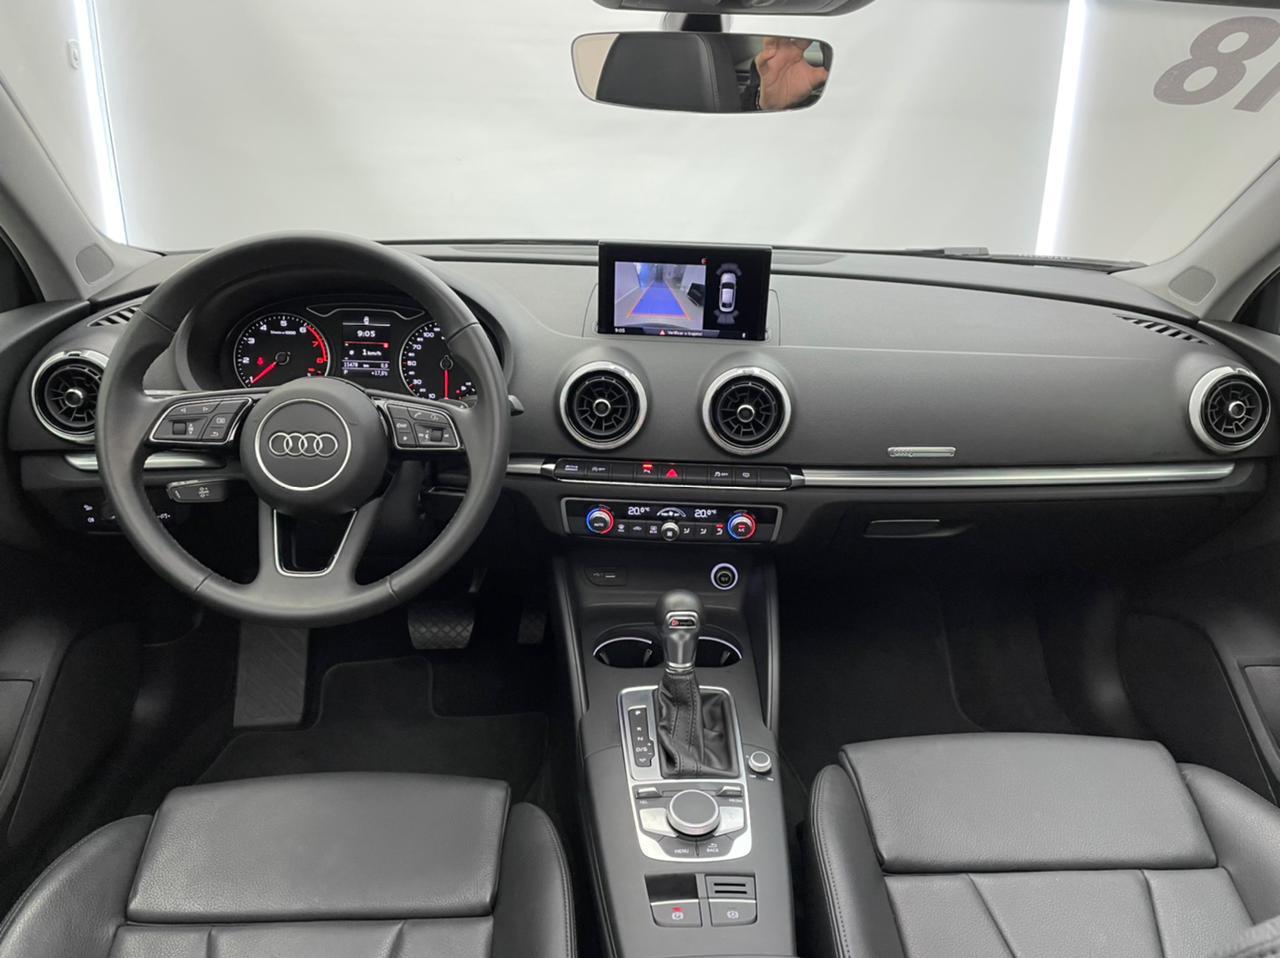 Audi-A3-A3 Sed. Ambition 2.0 TSFI 220cv S-tronic